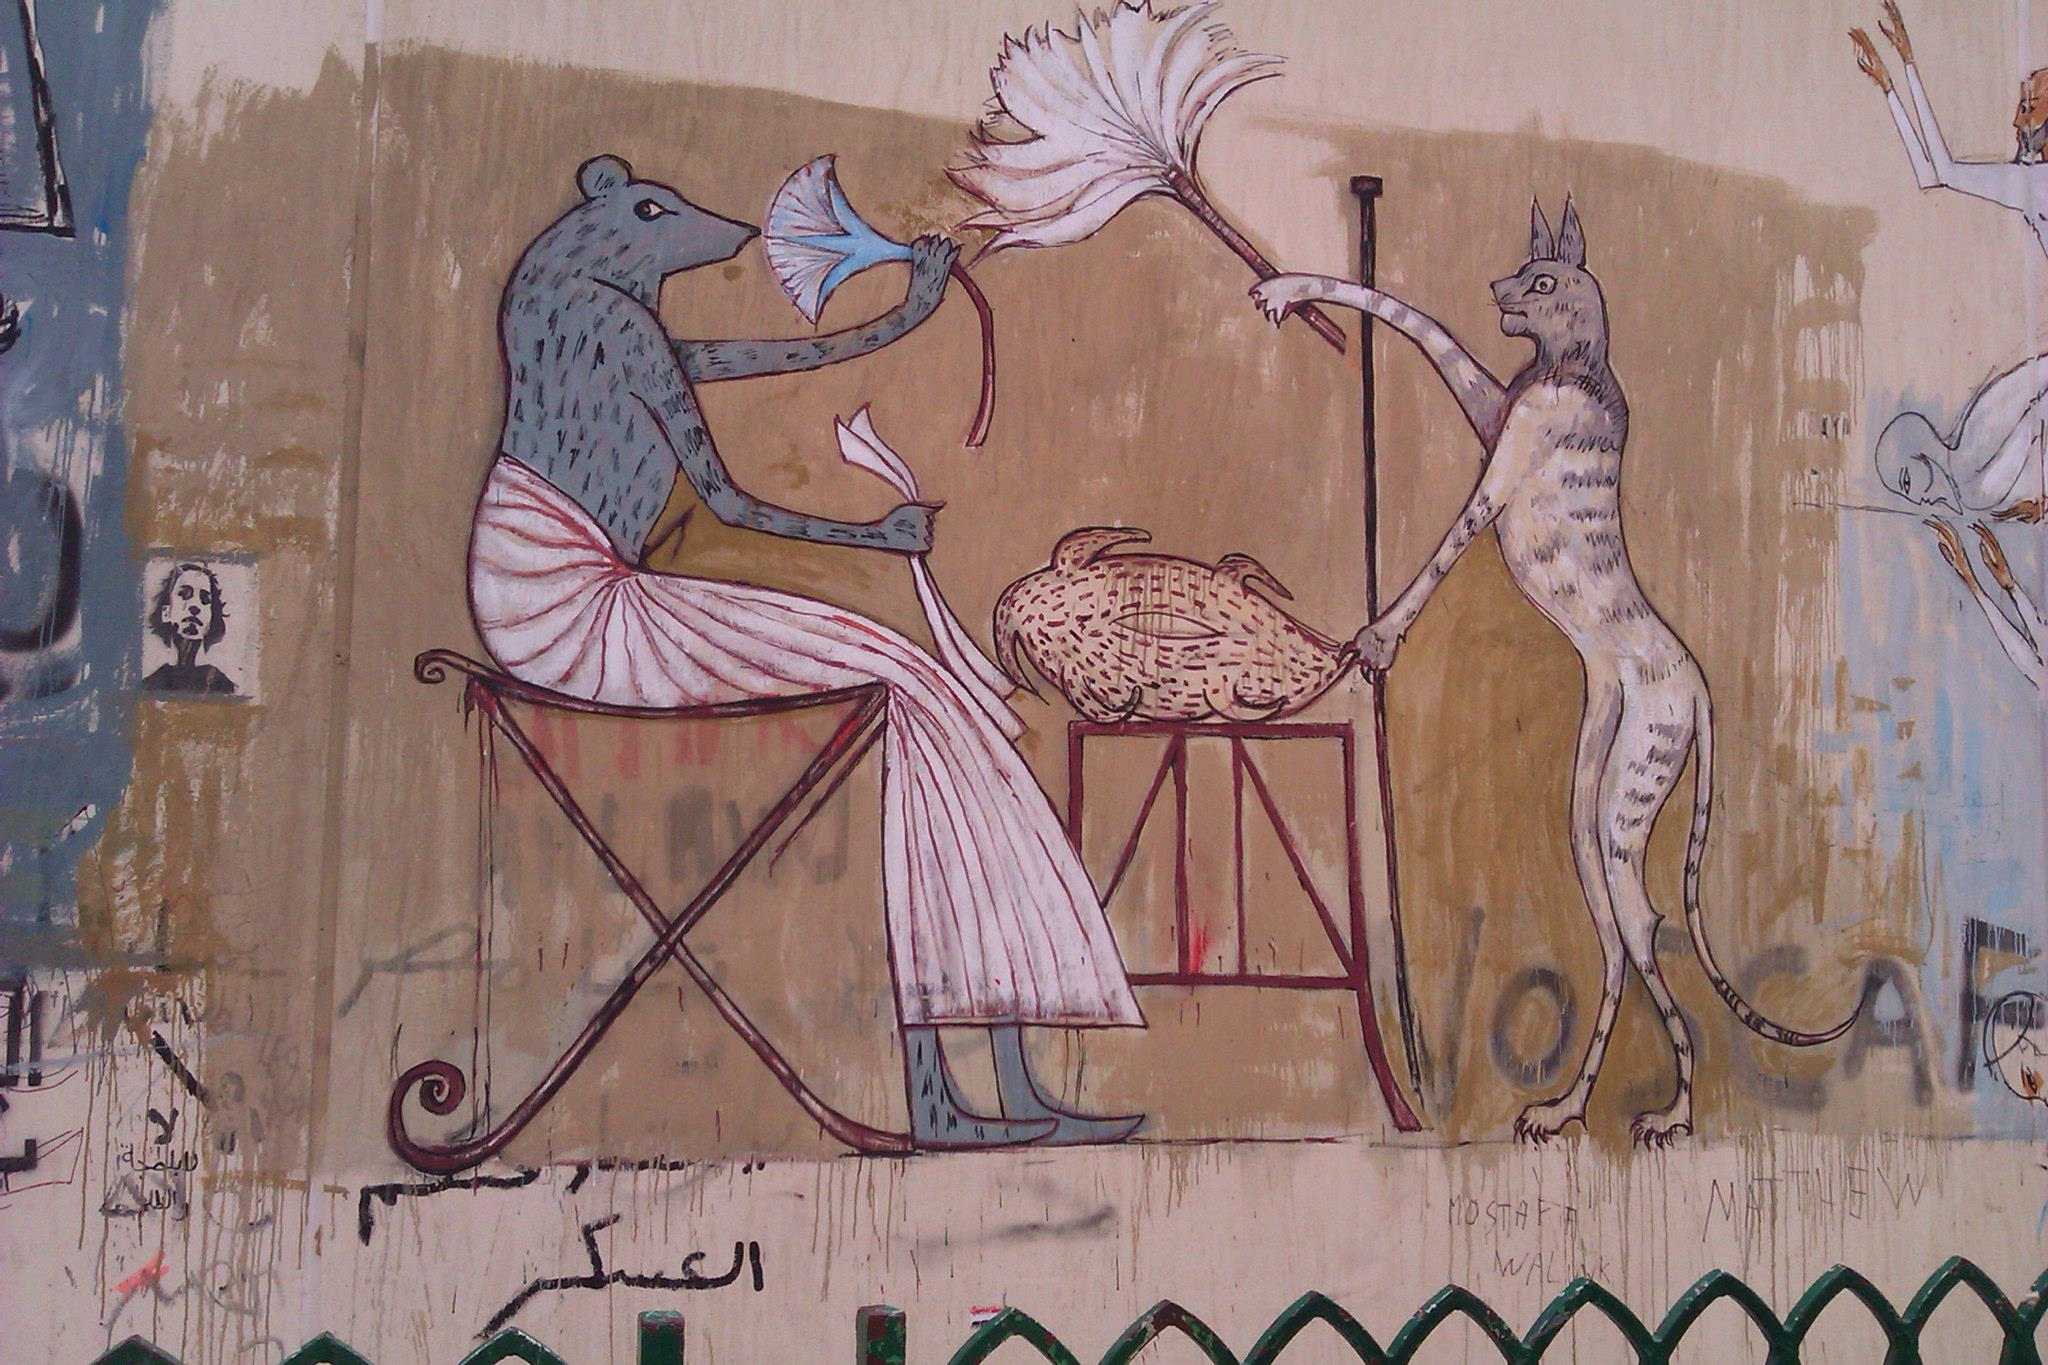 Mural of the Regime